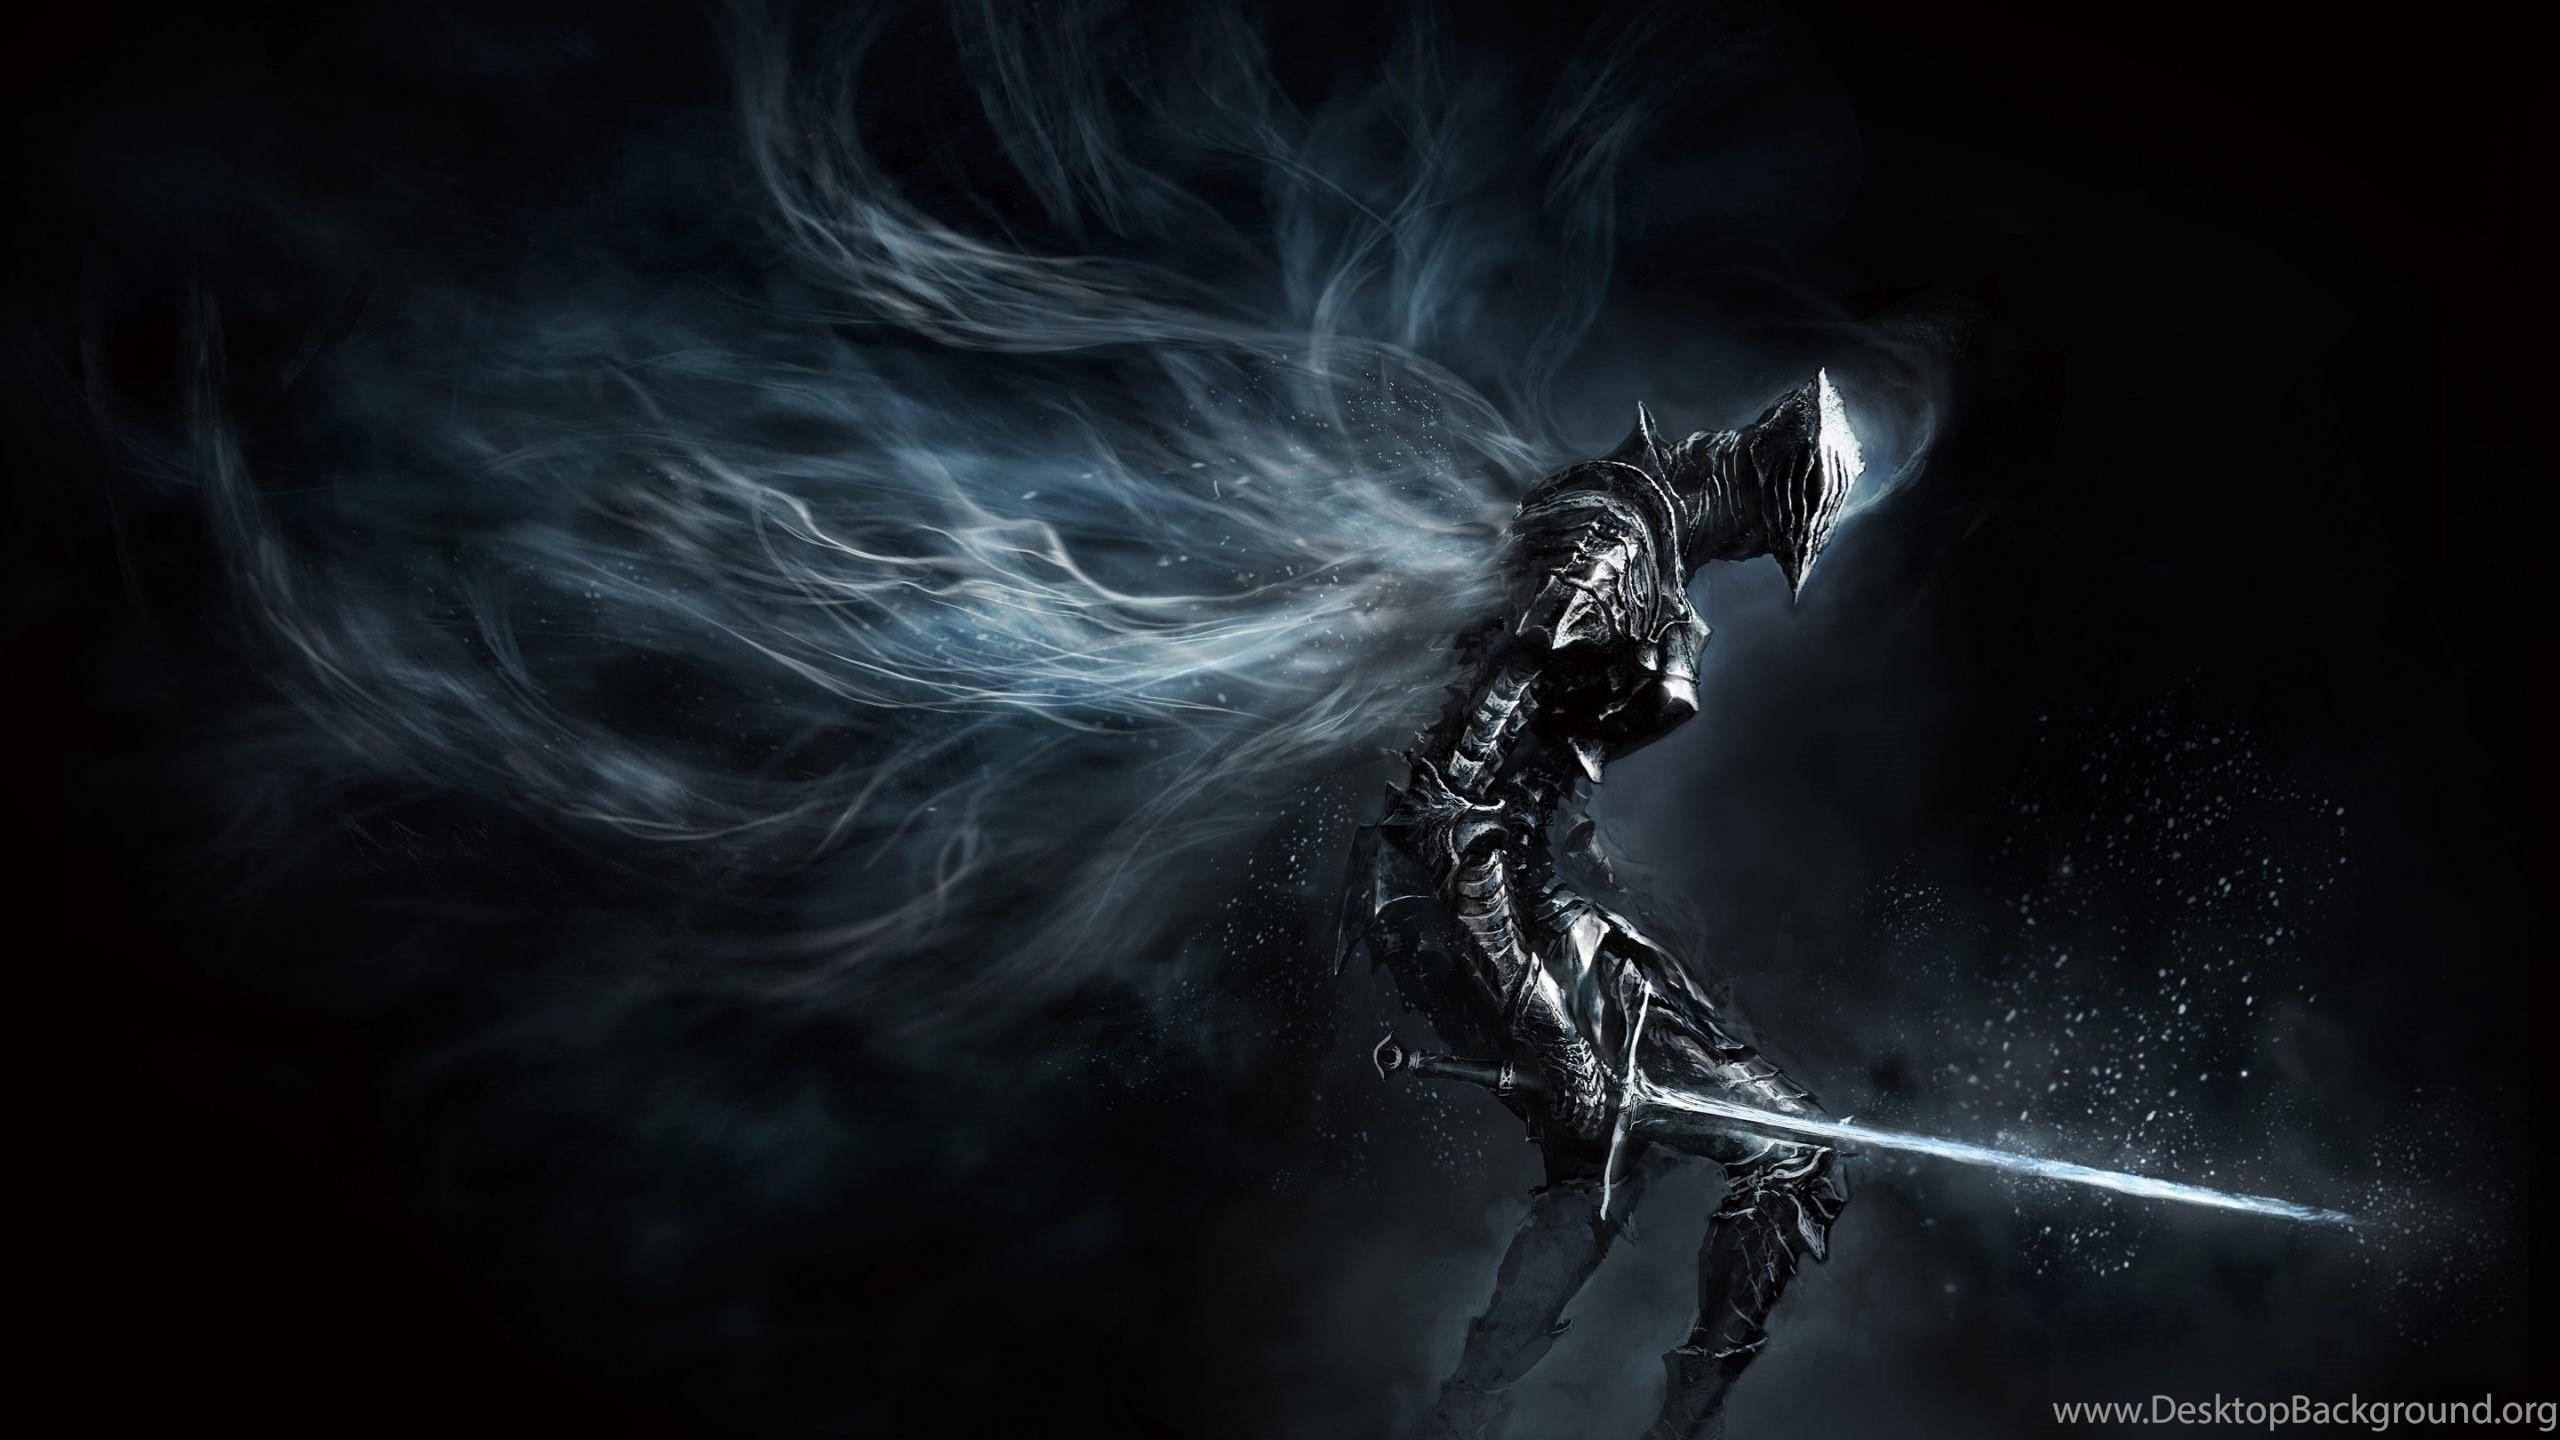 Dark Souls 3 21 9: Dark Souls 3 Game Art Wallpapers HD Download For Computer